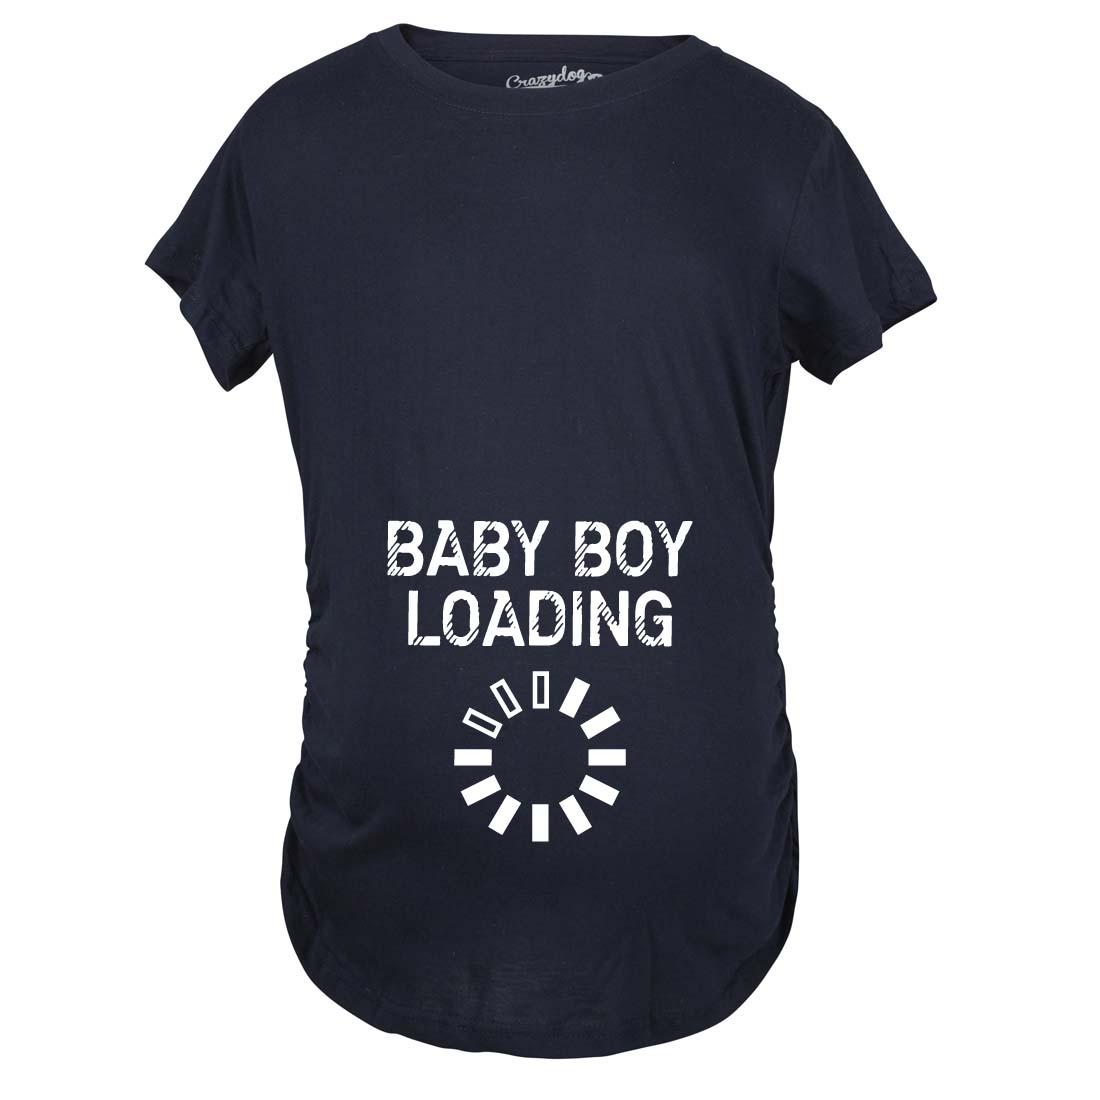 Maternity Baby Boy Loading Funny Nerdy Pregnancy ...